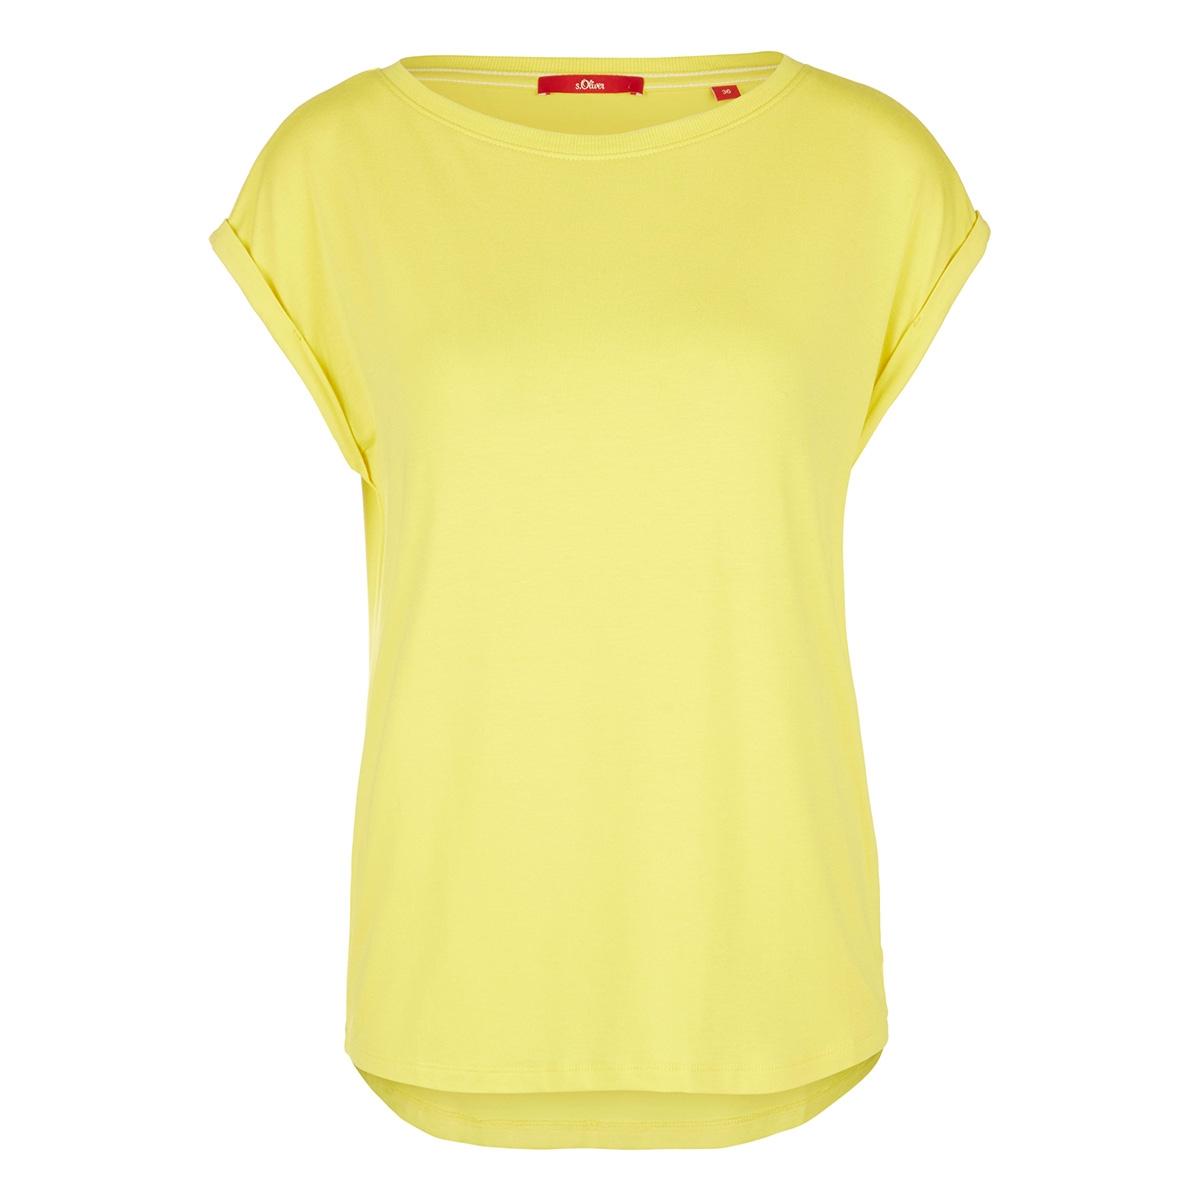 viscose shirt met geribde rand 14004325091 s.oliver t-shirt 1201